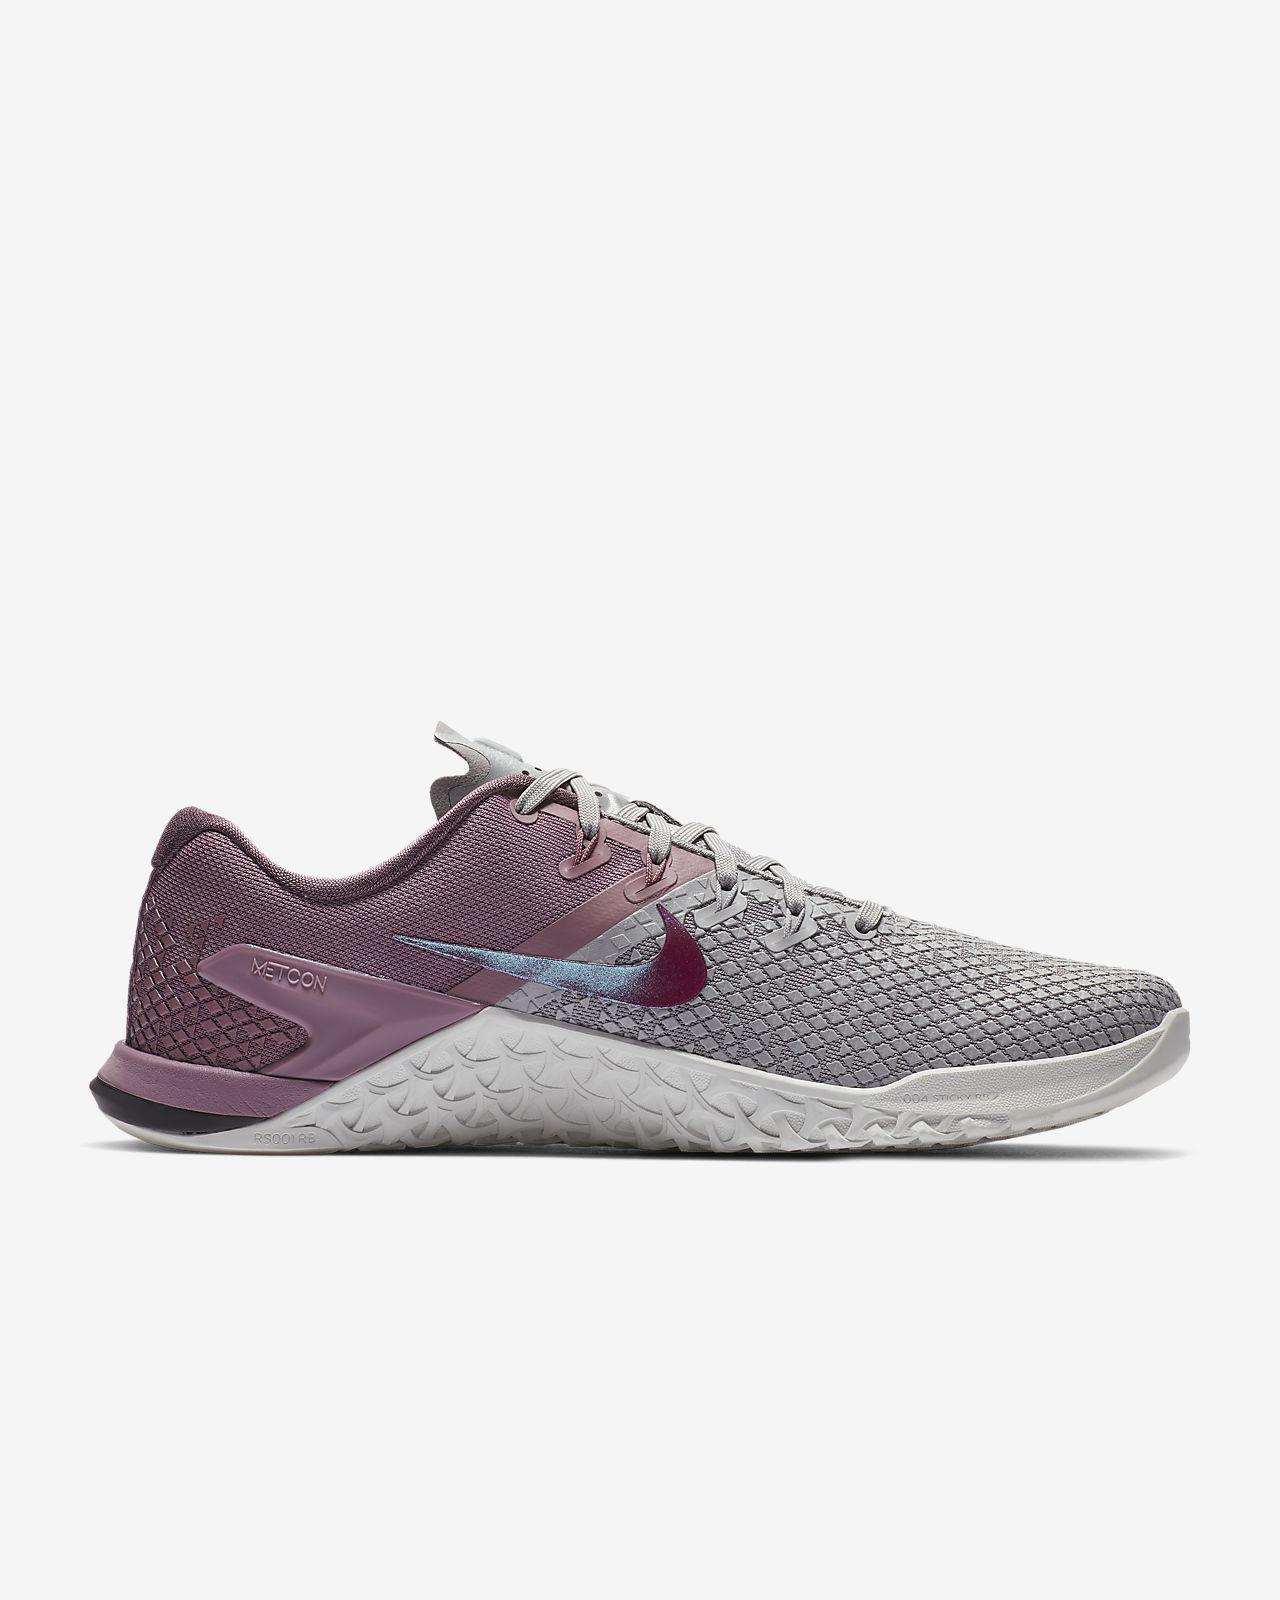 brand new 27e84 f1e0b ... Nike Metcon 4 XD Women s Cross-Training Weightlifting Shoe